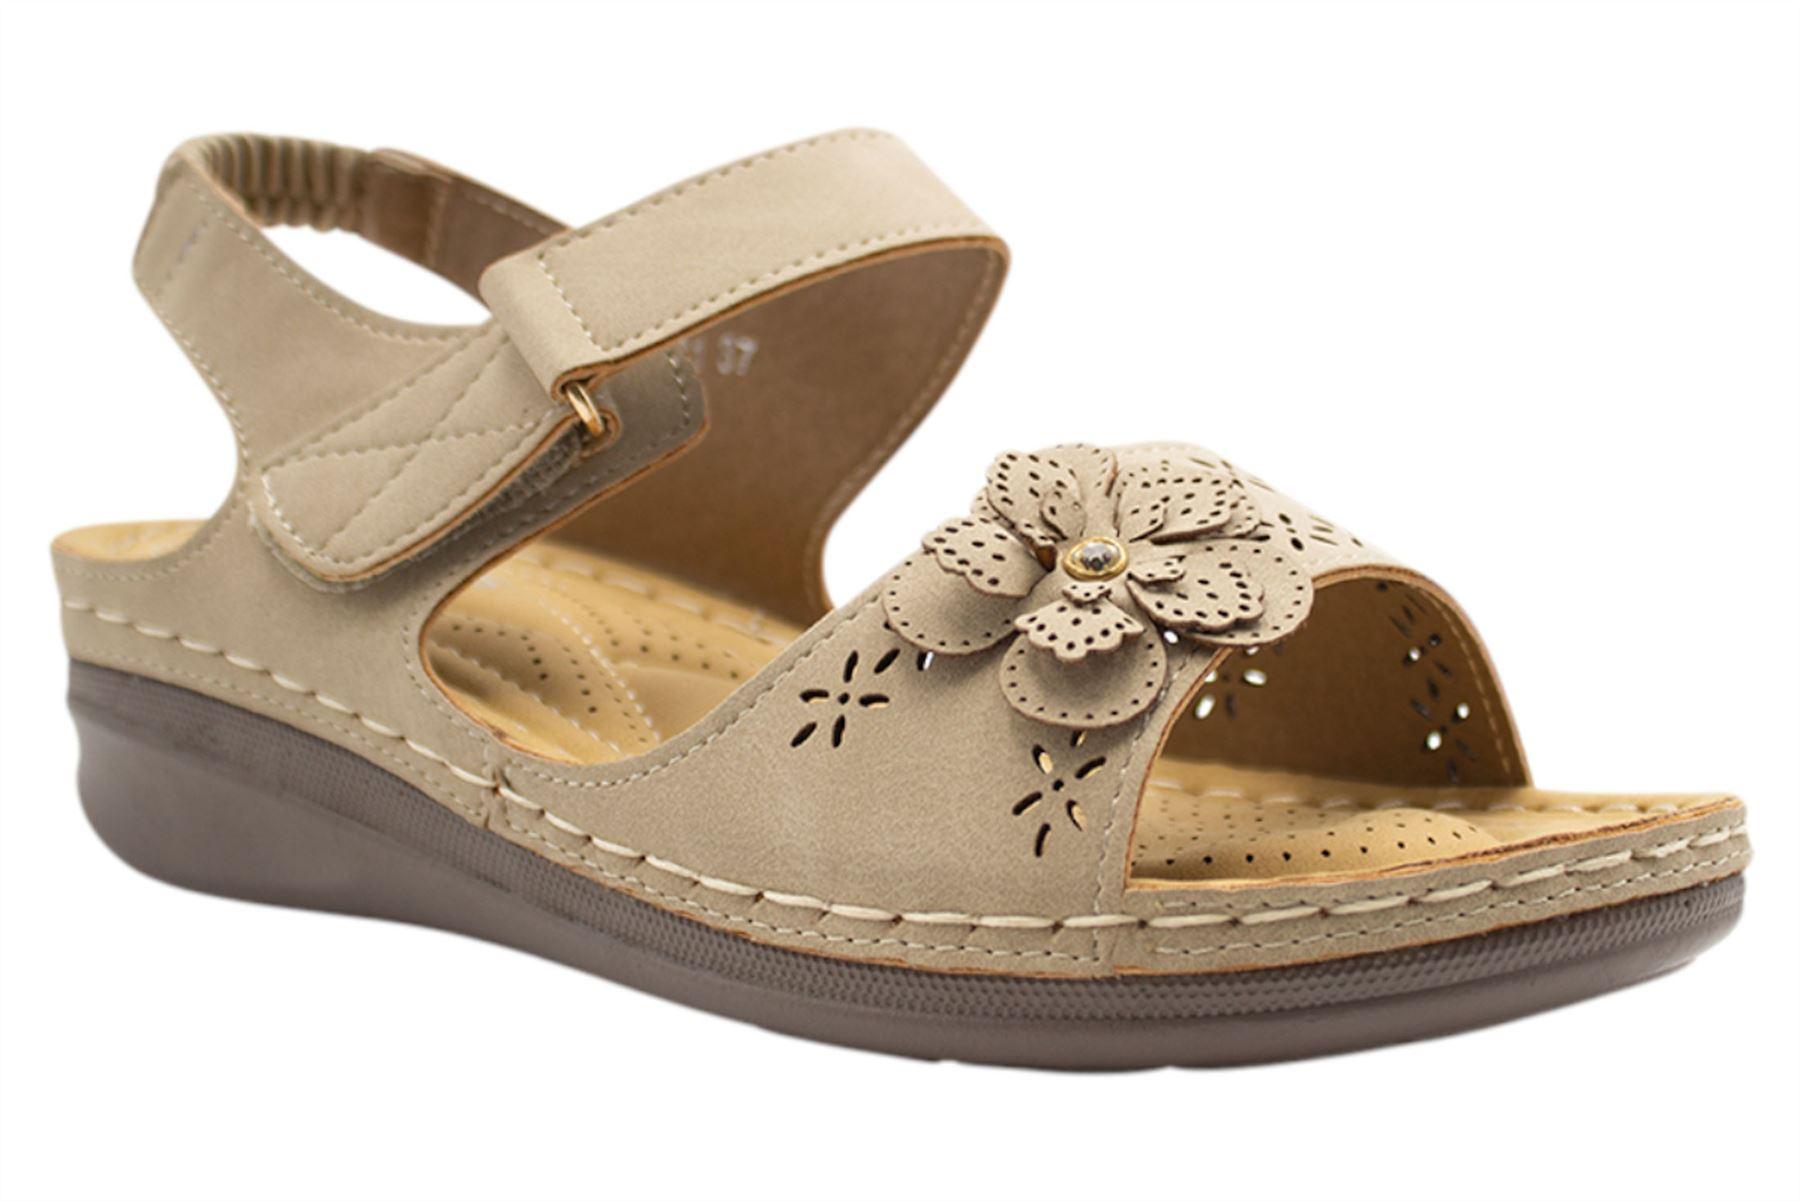 Ladies-Sandals-Womens-Mid-Heel-Comfort-Summer-Beach-Casual-Wear miniatura 9